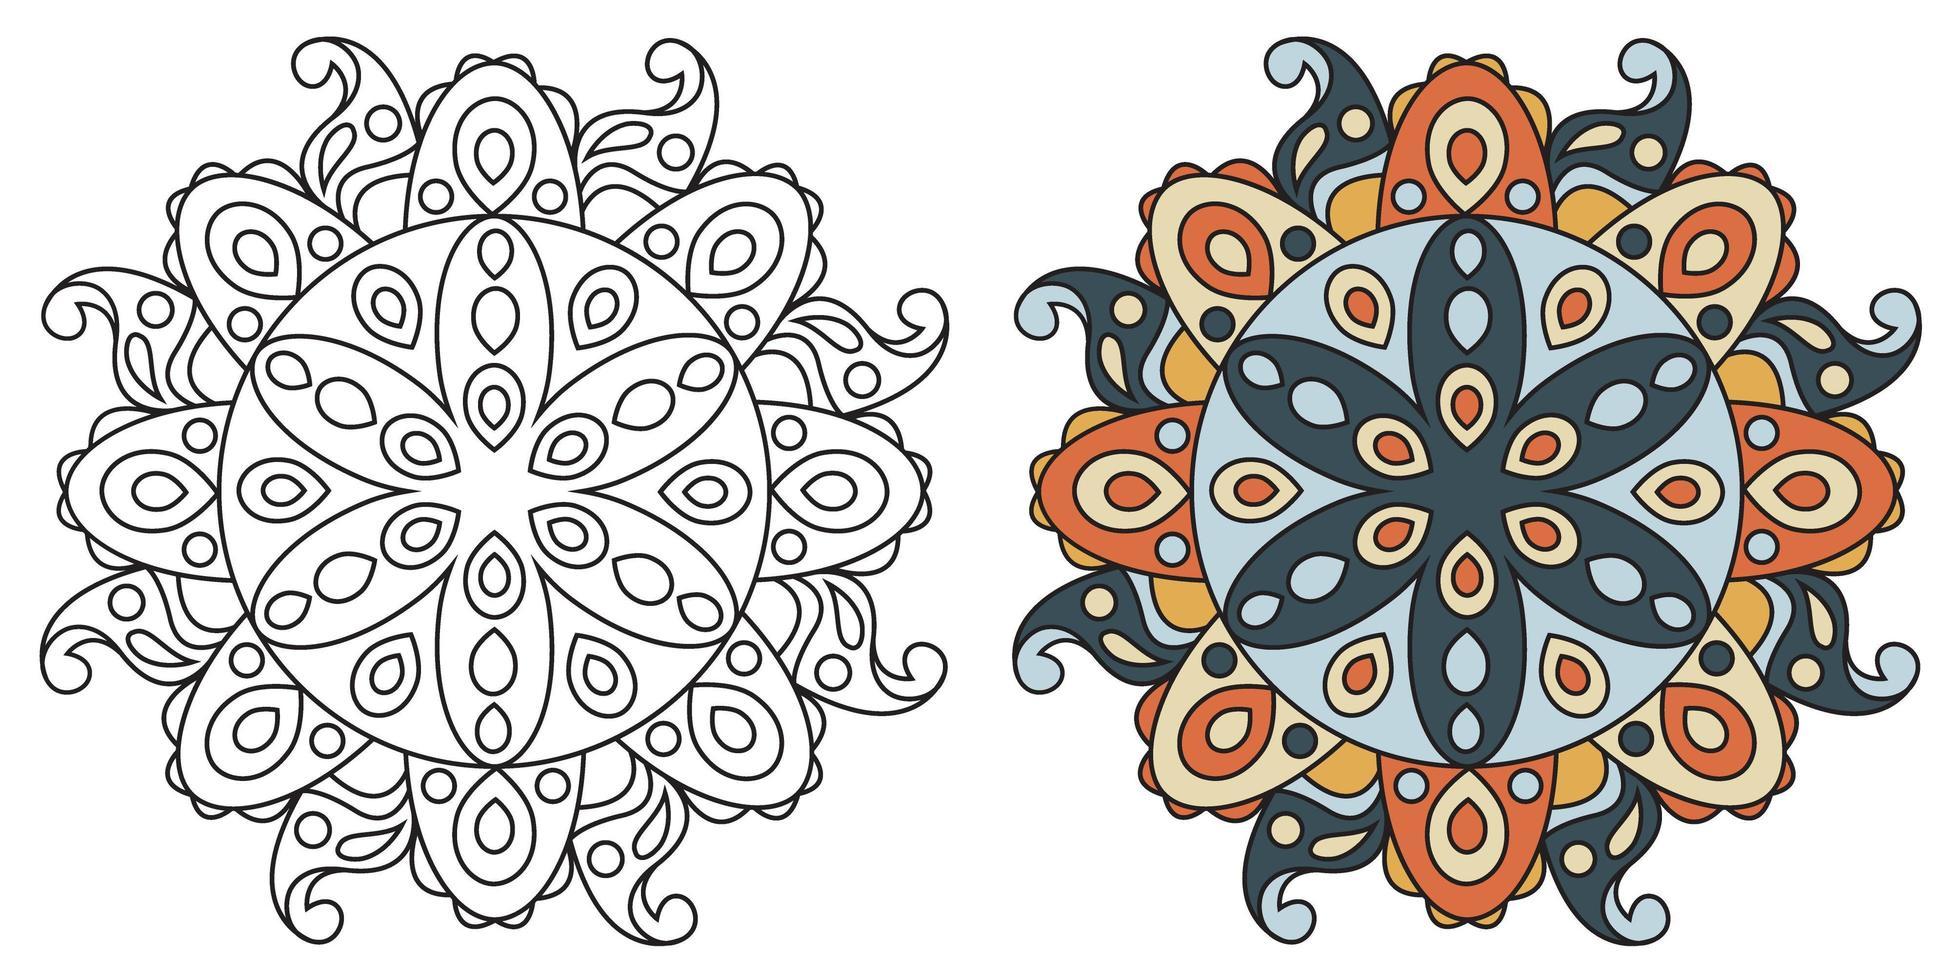 página do livro para colorir de mandala decorativa arredondada para colorir vetor